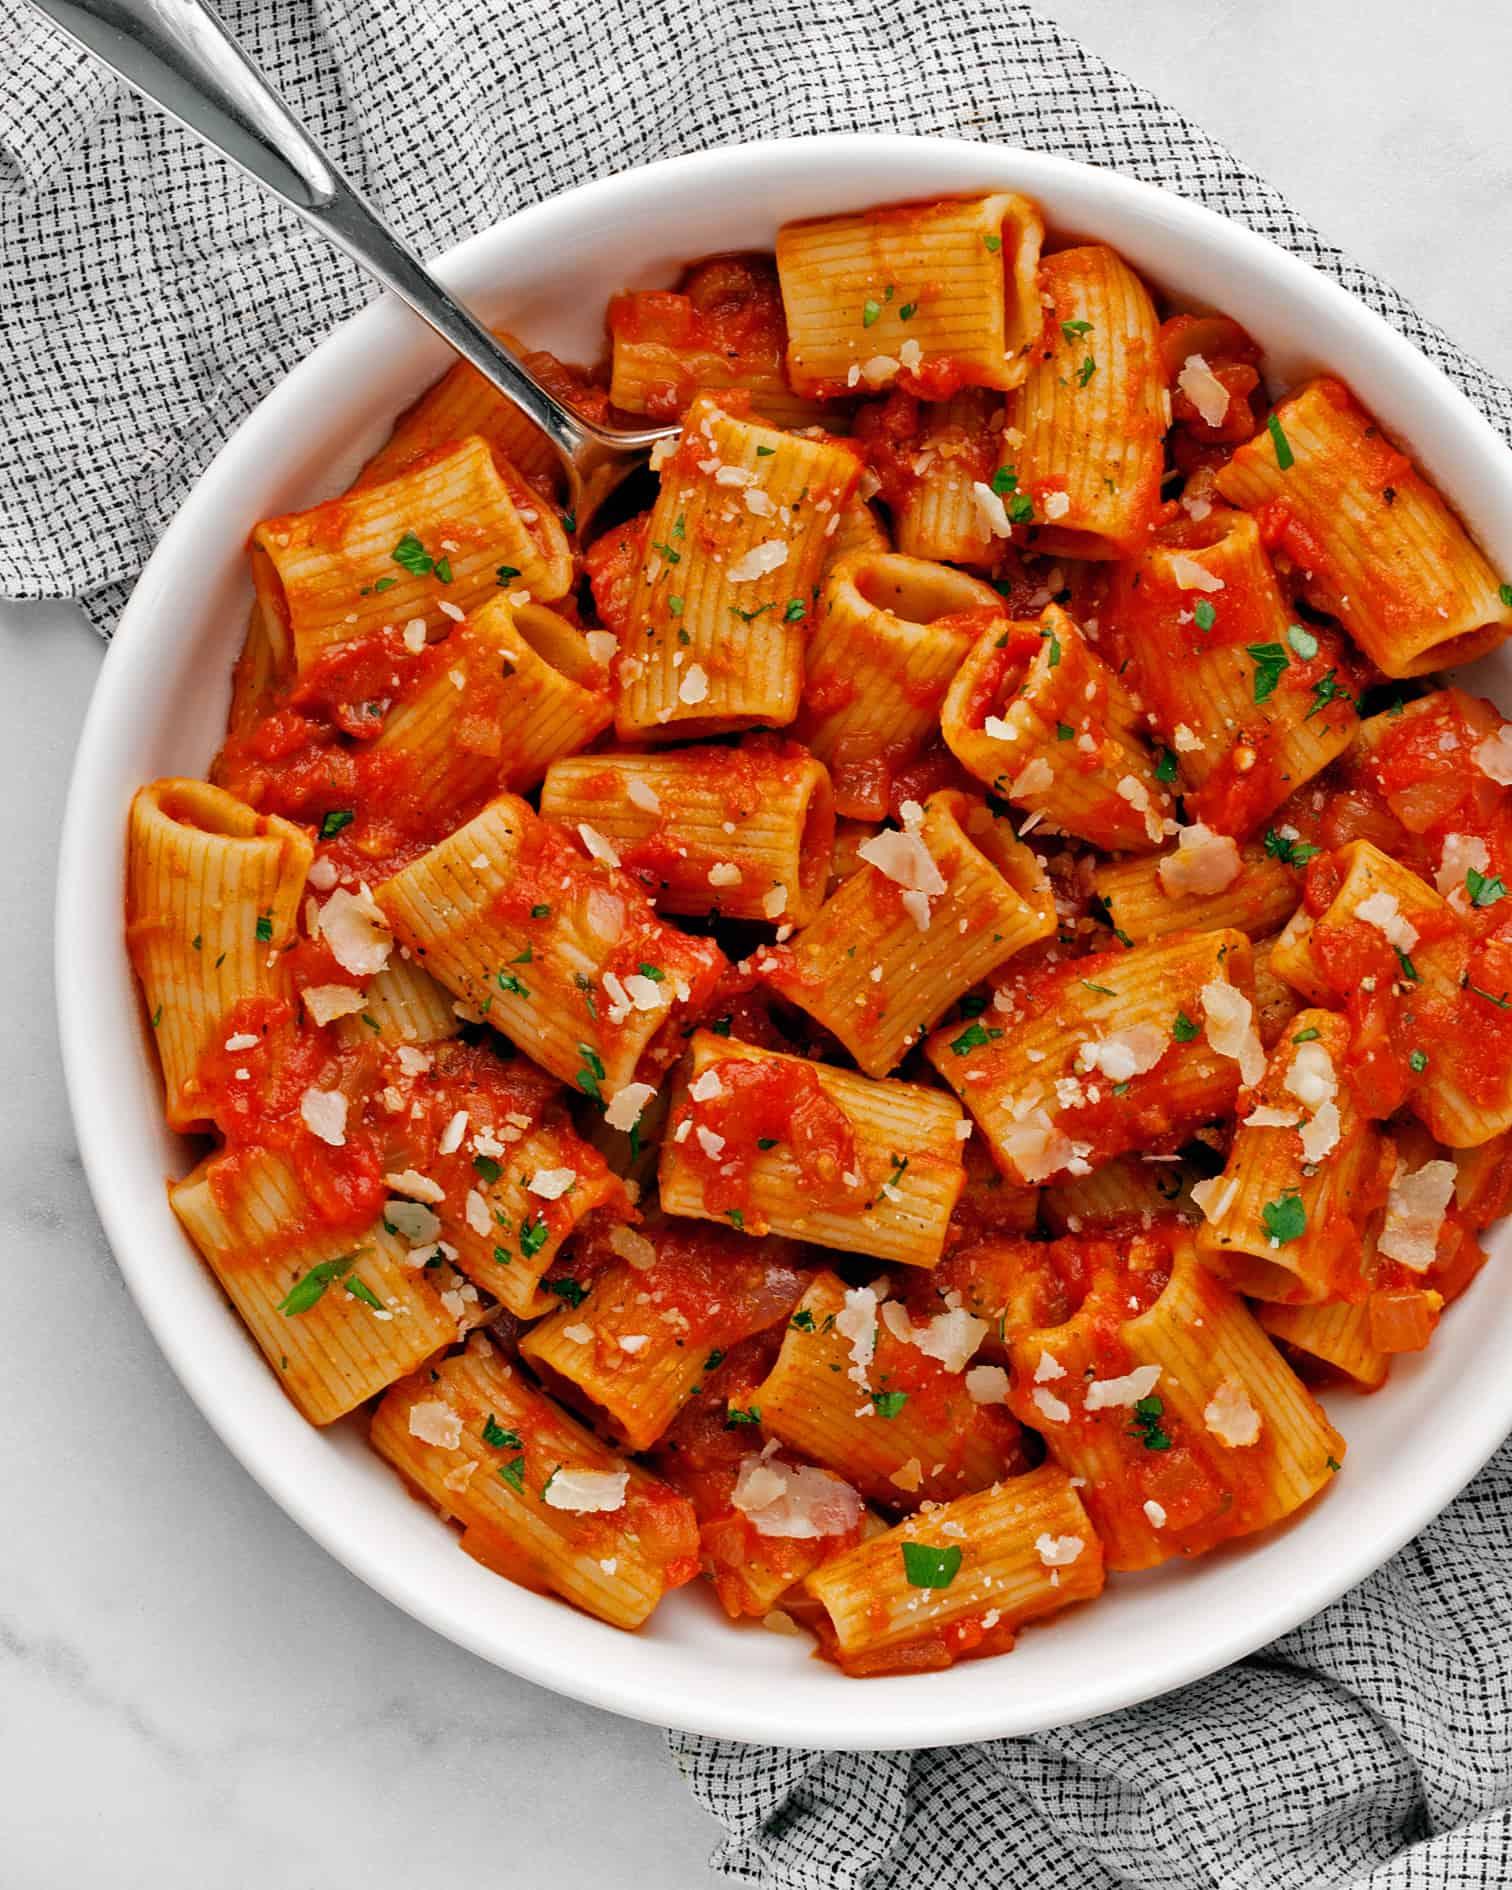 Rigatoni with Tomato Sauce